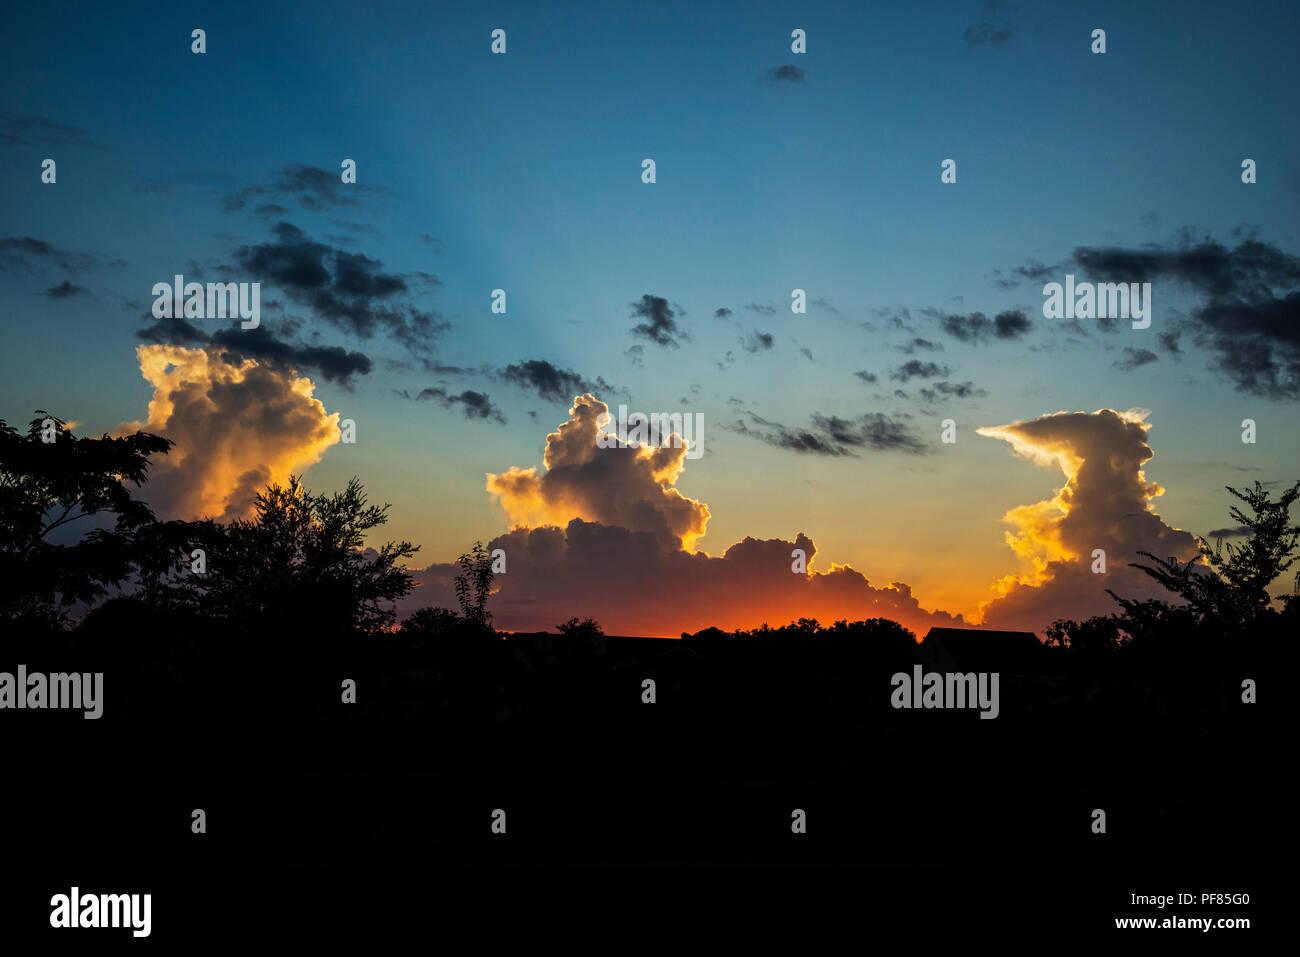 Sonnenuntergang Wolken in North Central Florida. Stockbild